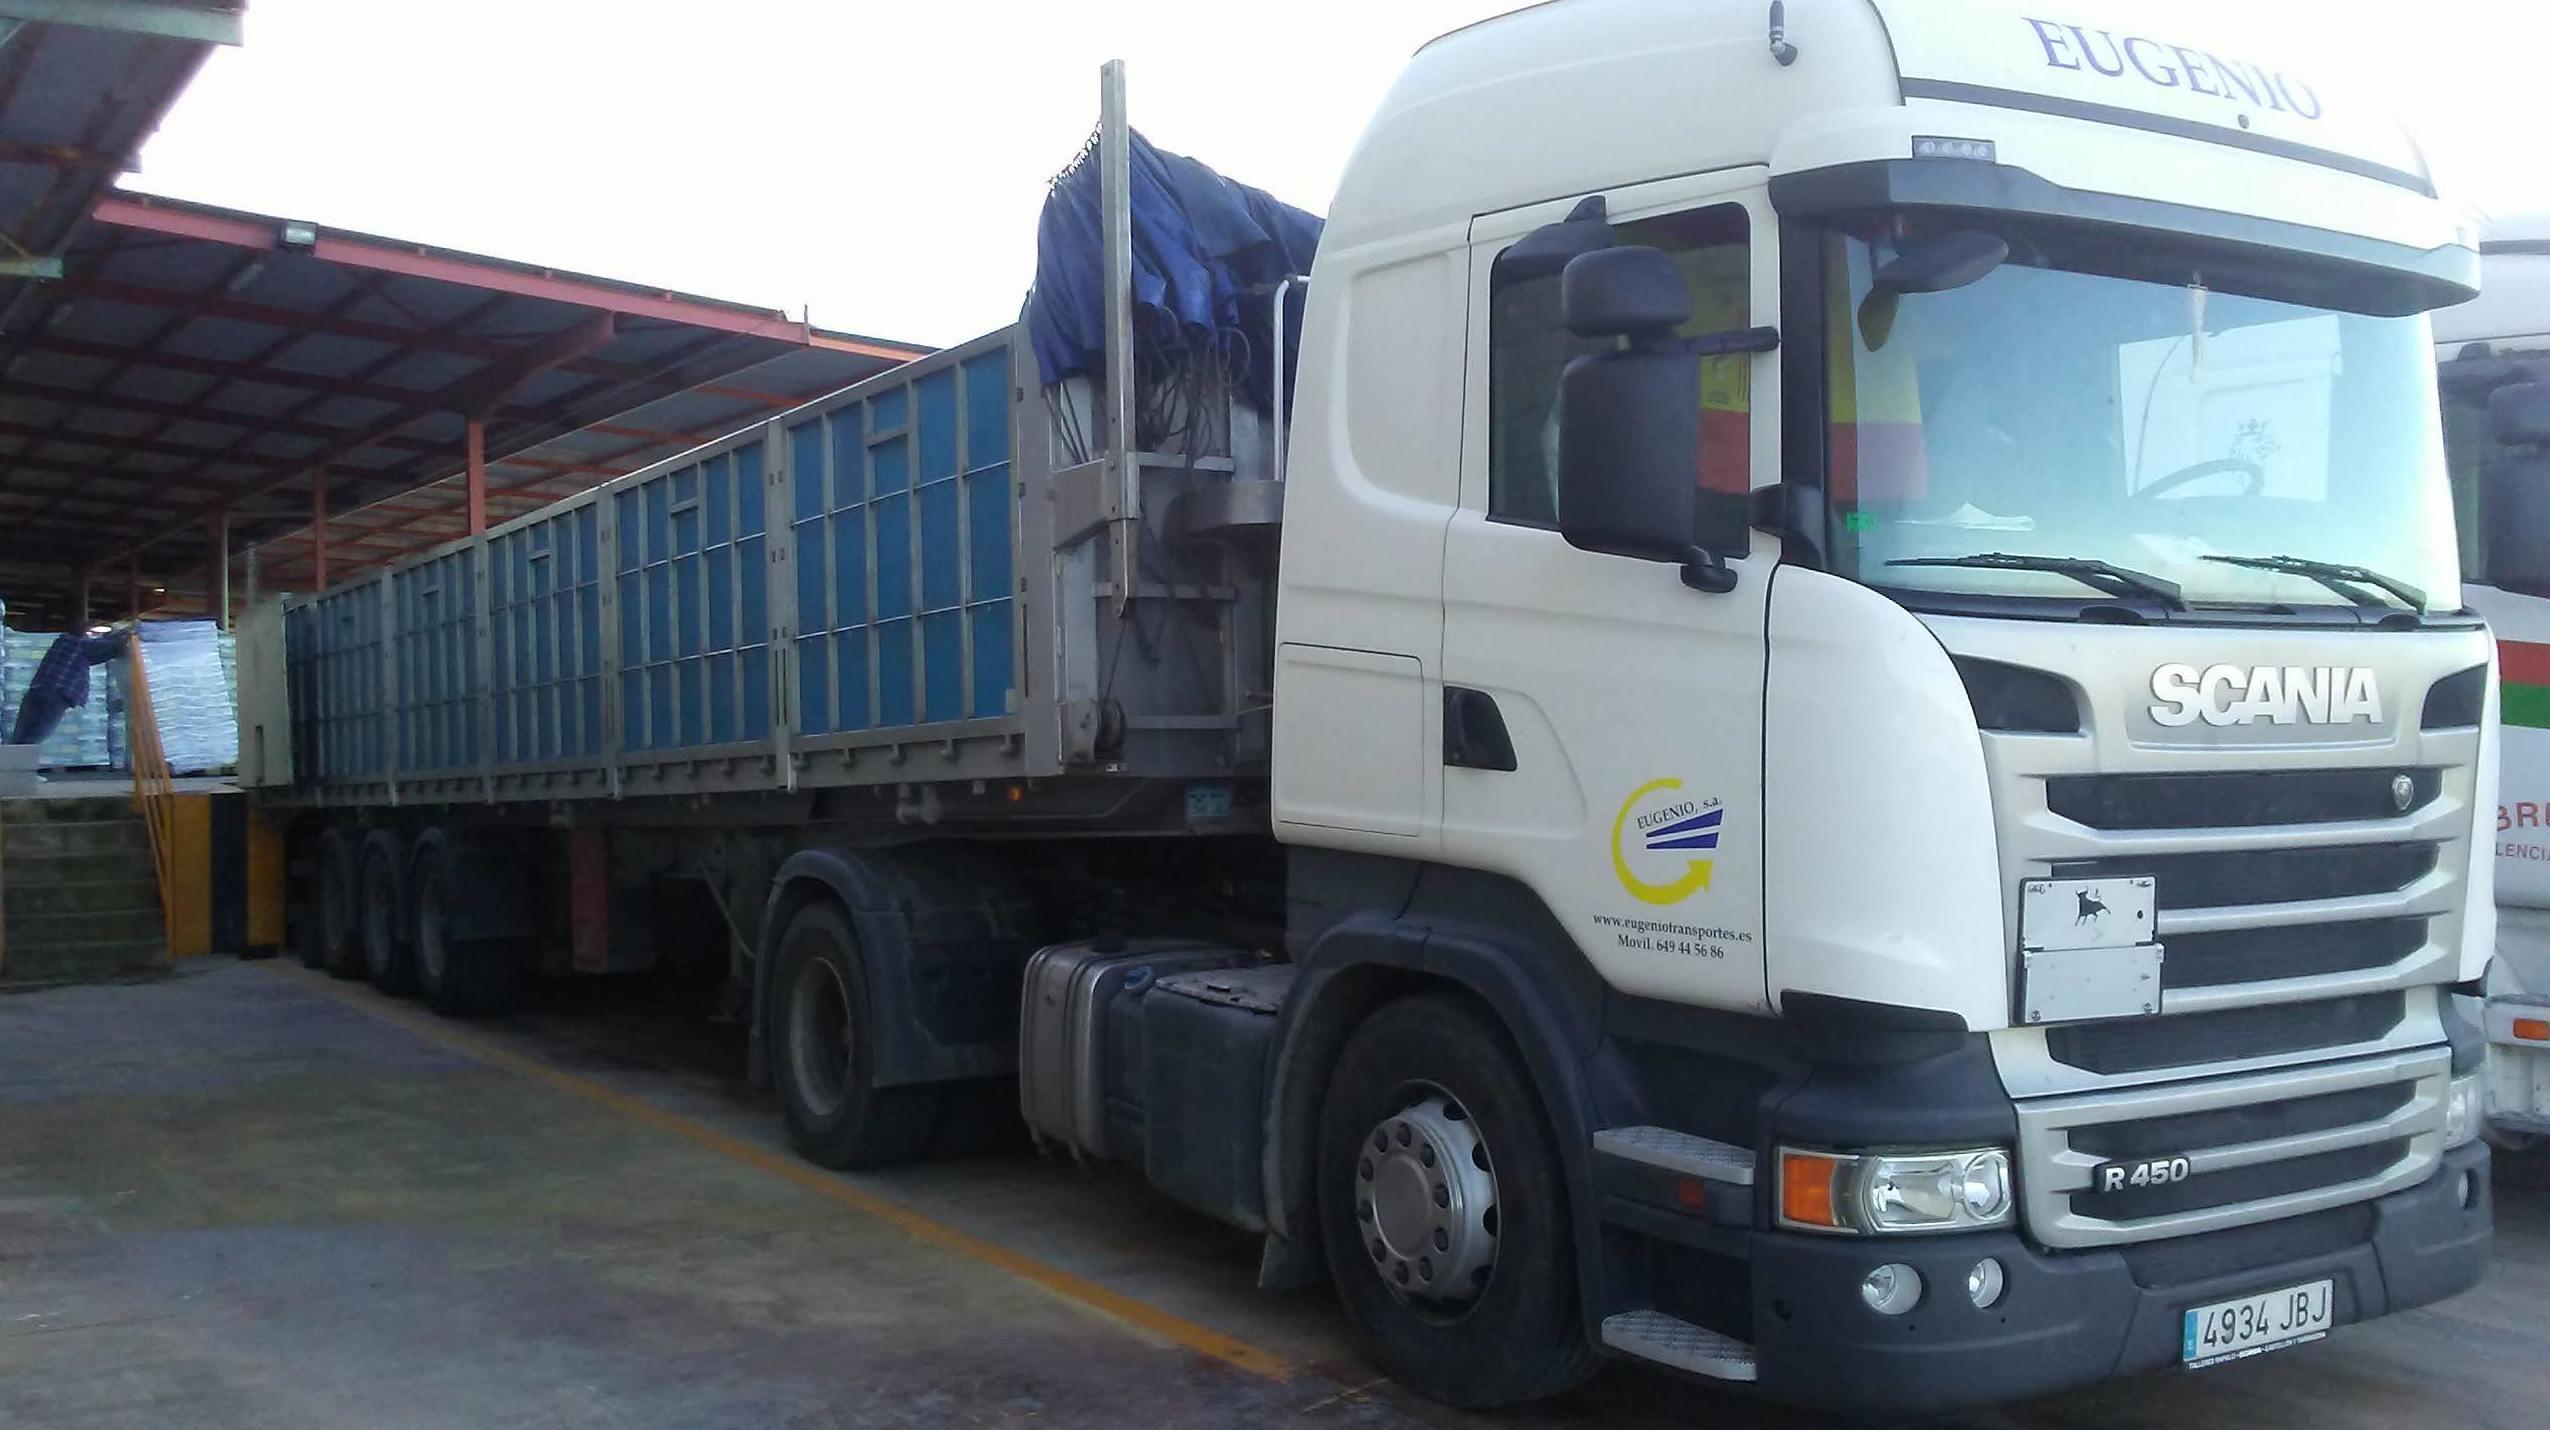 Foto 5 de Transporte de mercancías en Ribesalbes   EUGENIO, S. A.